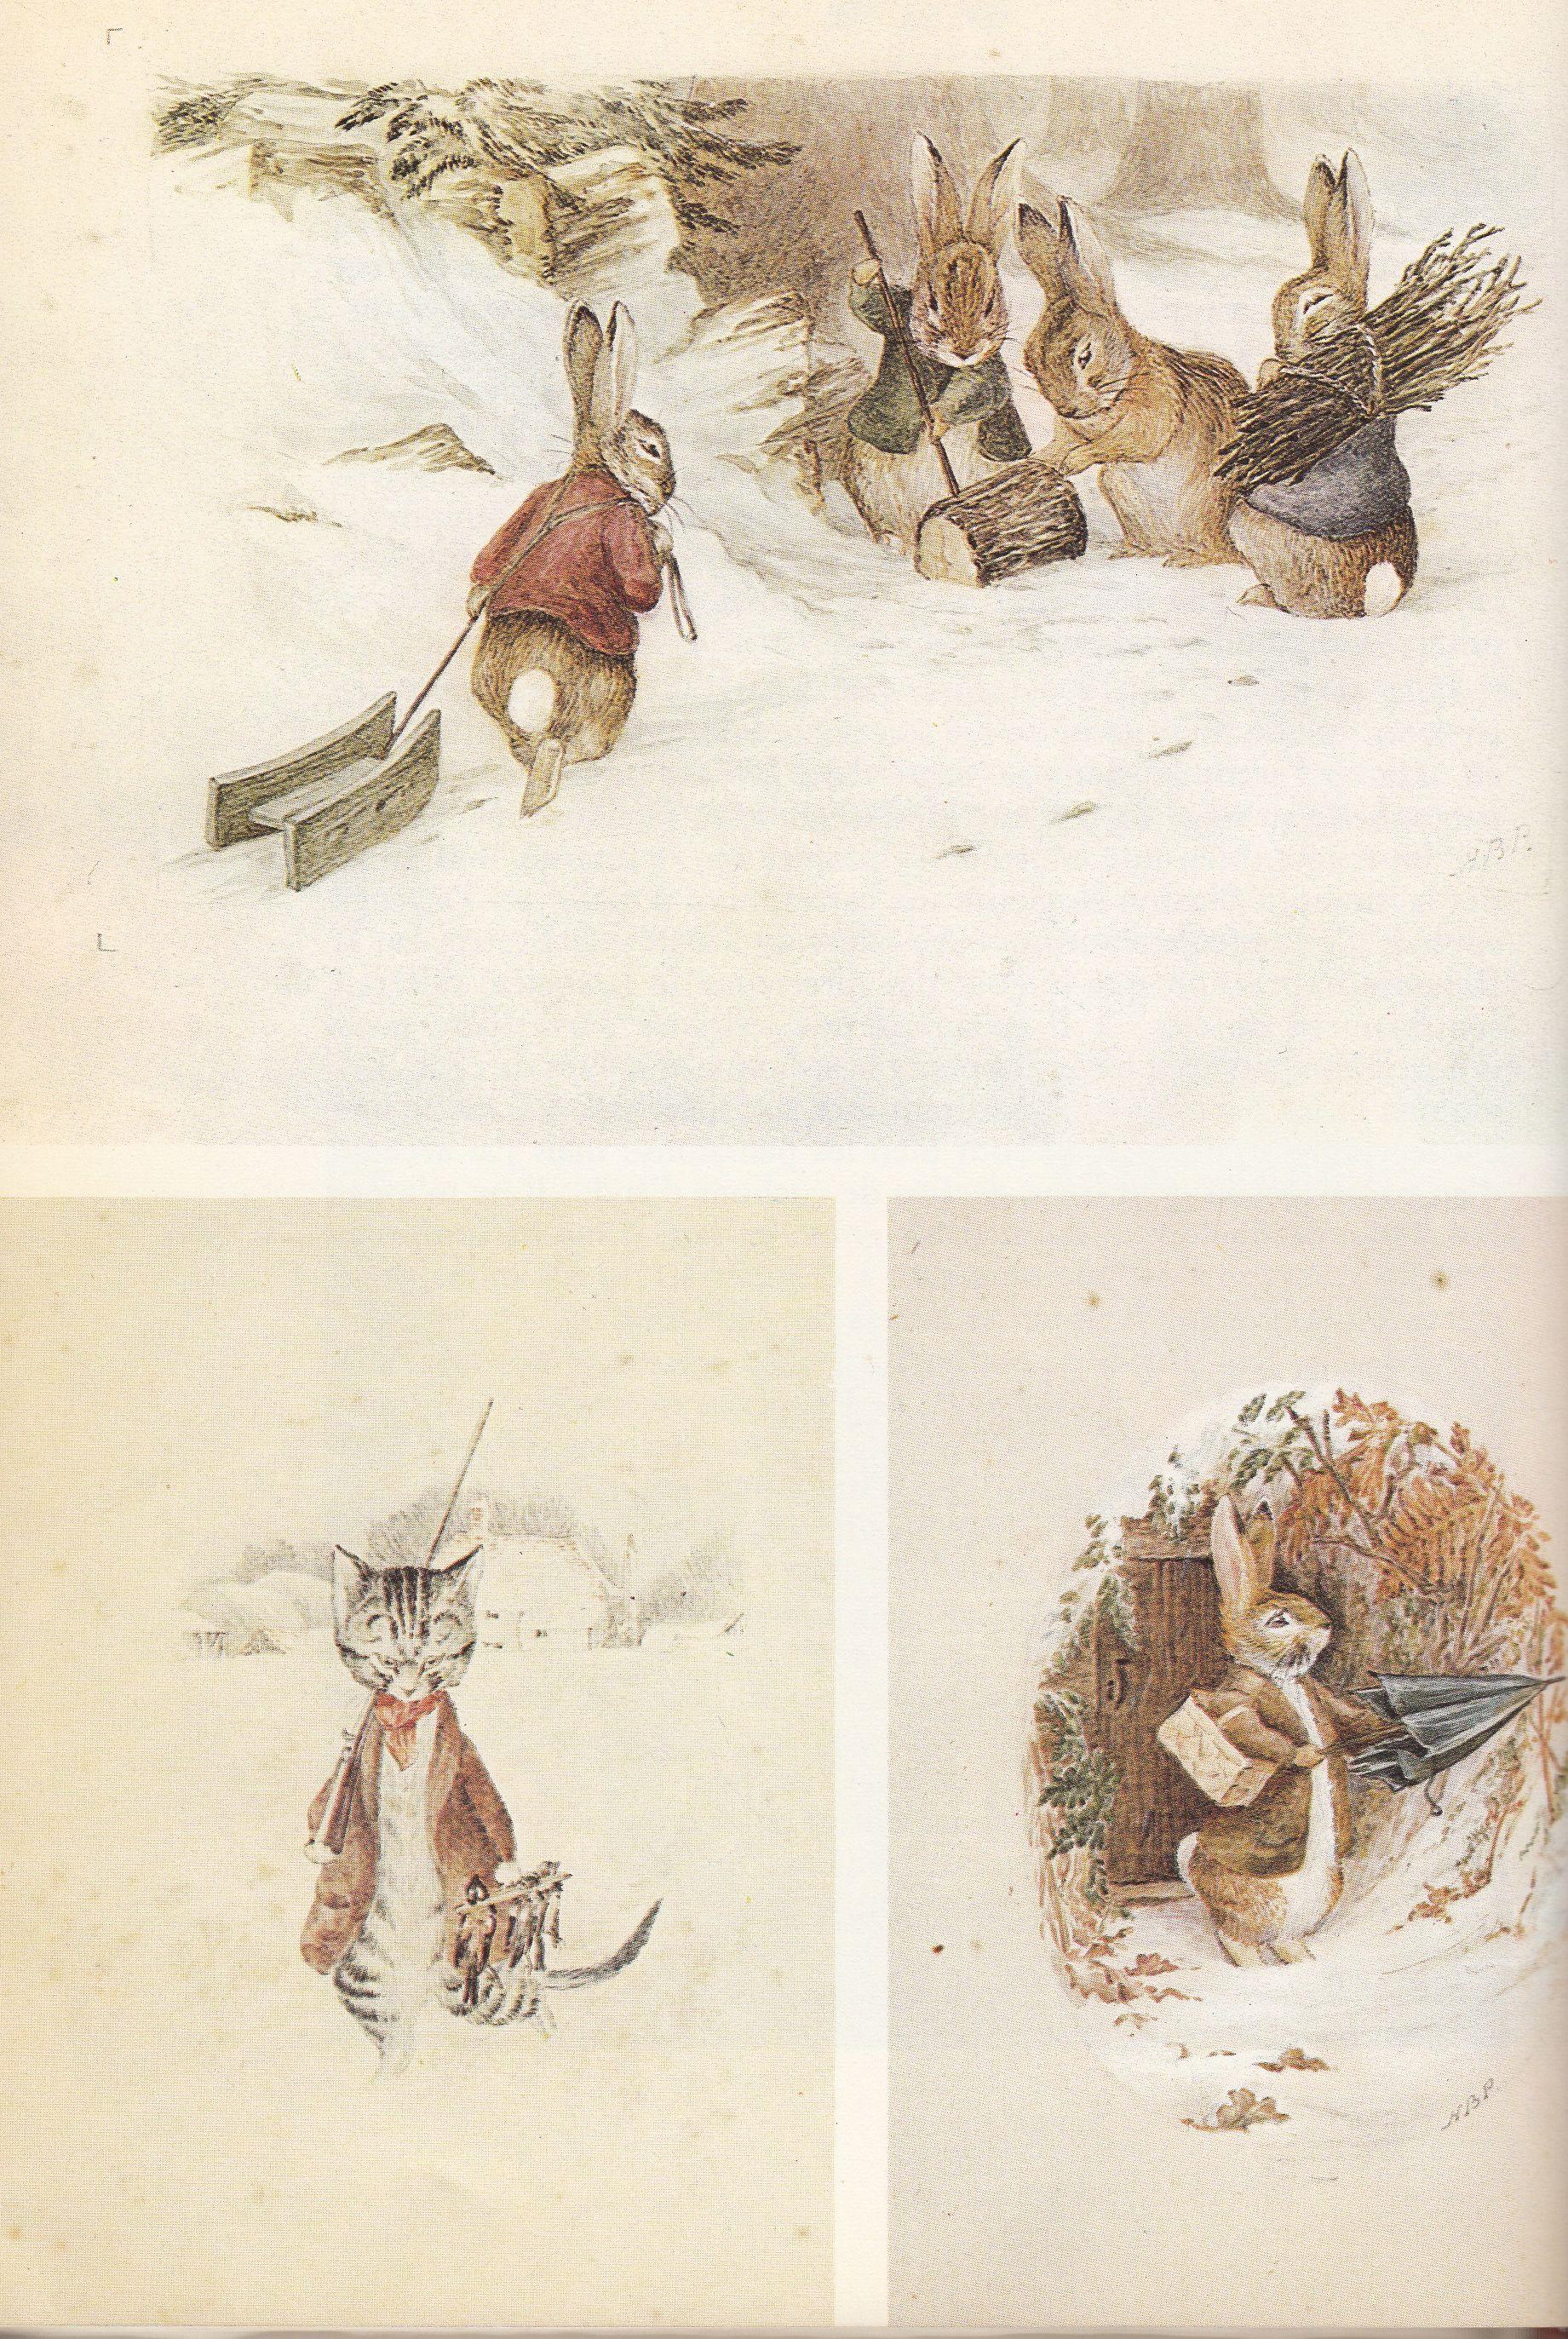 Rabbit speed dating uk – Adele Gray Ministries